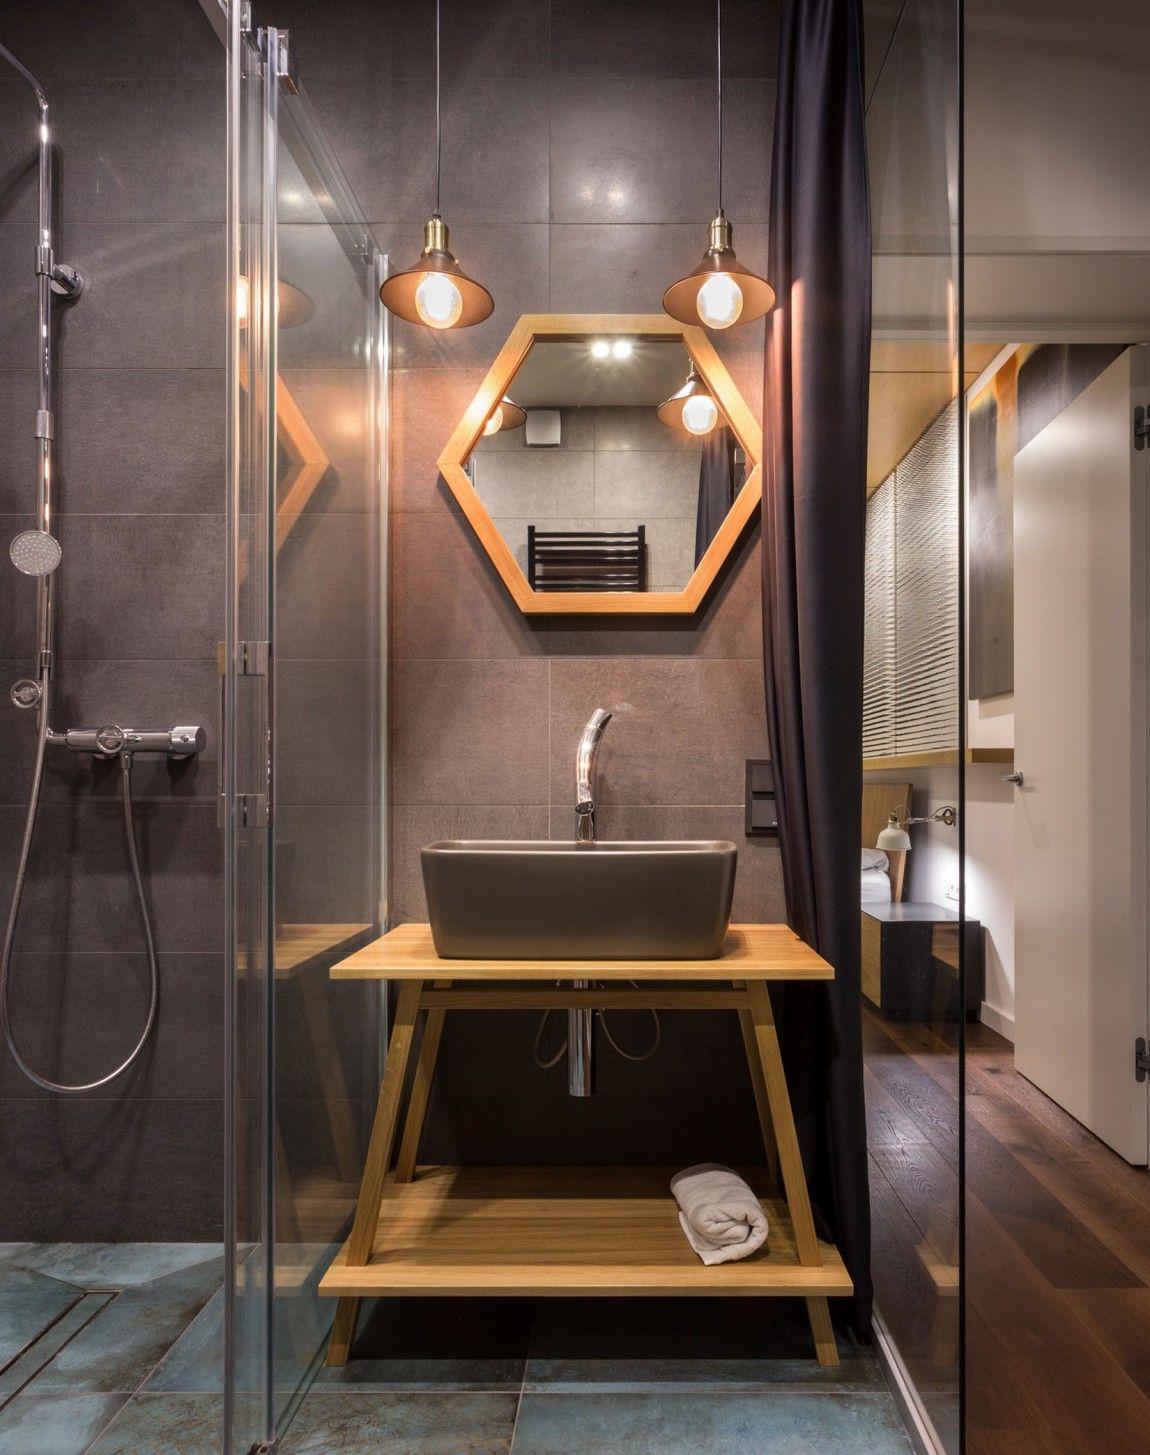 Svoya Studio Designs A Chic Apartment In Kiev Homedsgn Industrial Bathroom Decor Industrial Bathroom Design Bathroom Design